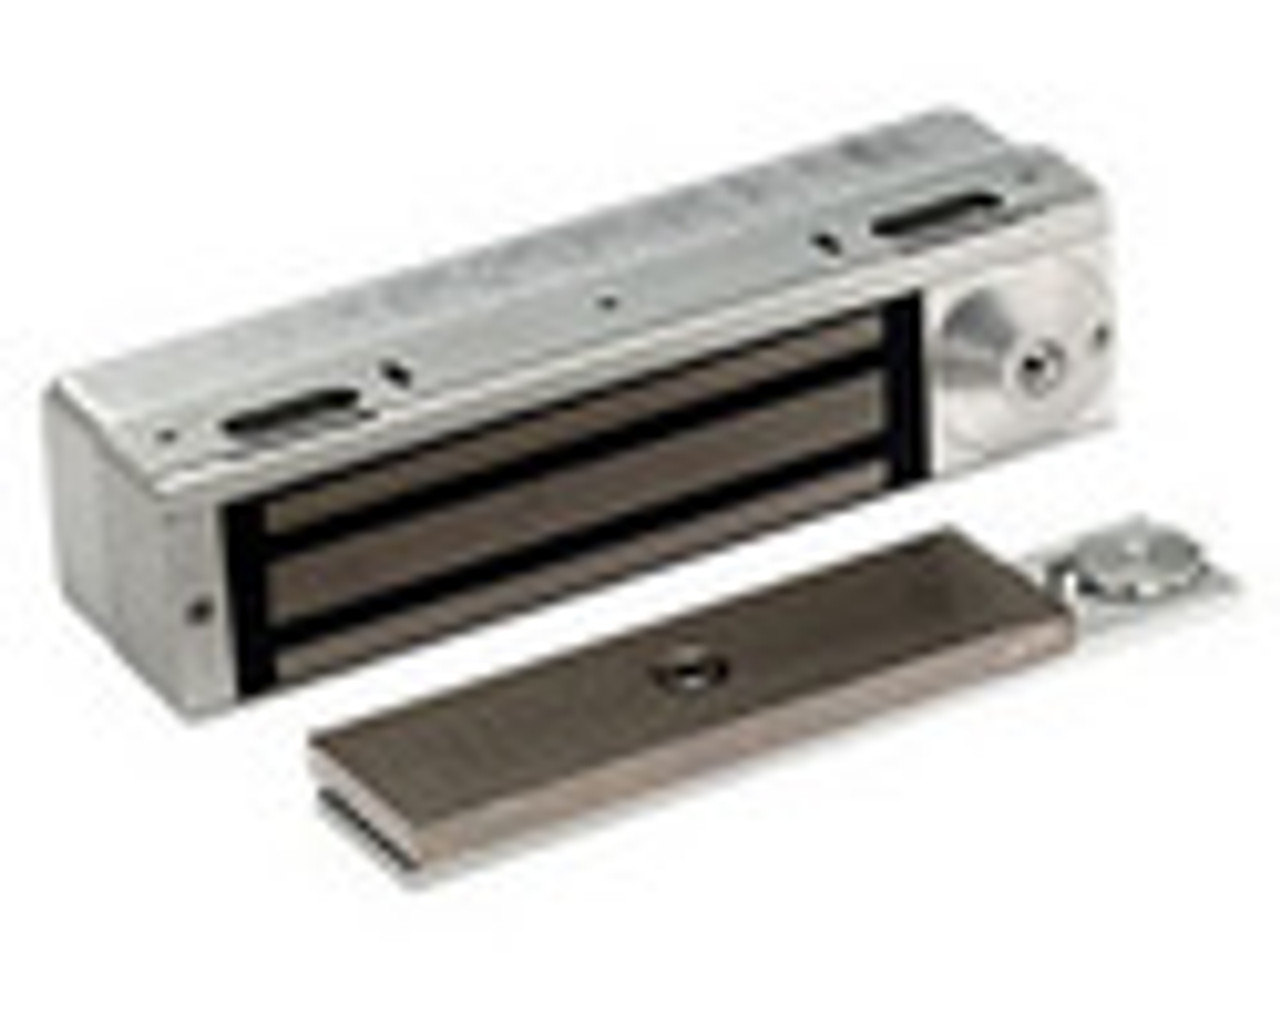 3101C-DSM-US3 DynaLock 3101C Series Delay Egress Electromagnetic Lock for Single Outswing Door with DSM in Bright Brass